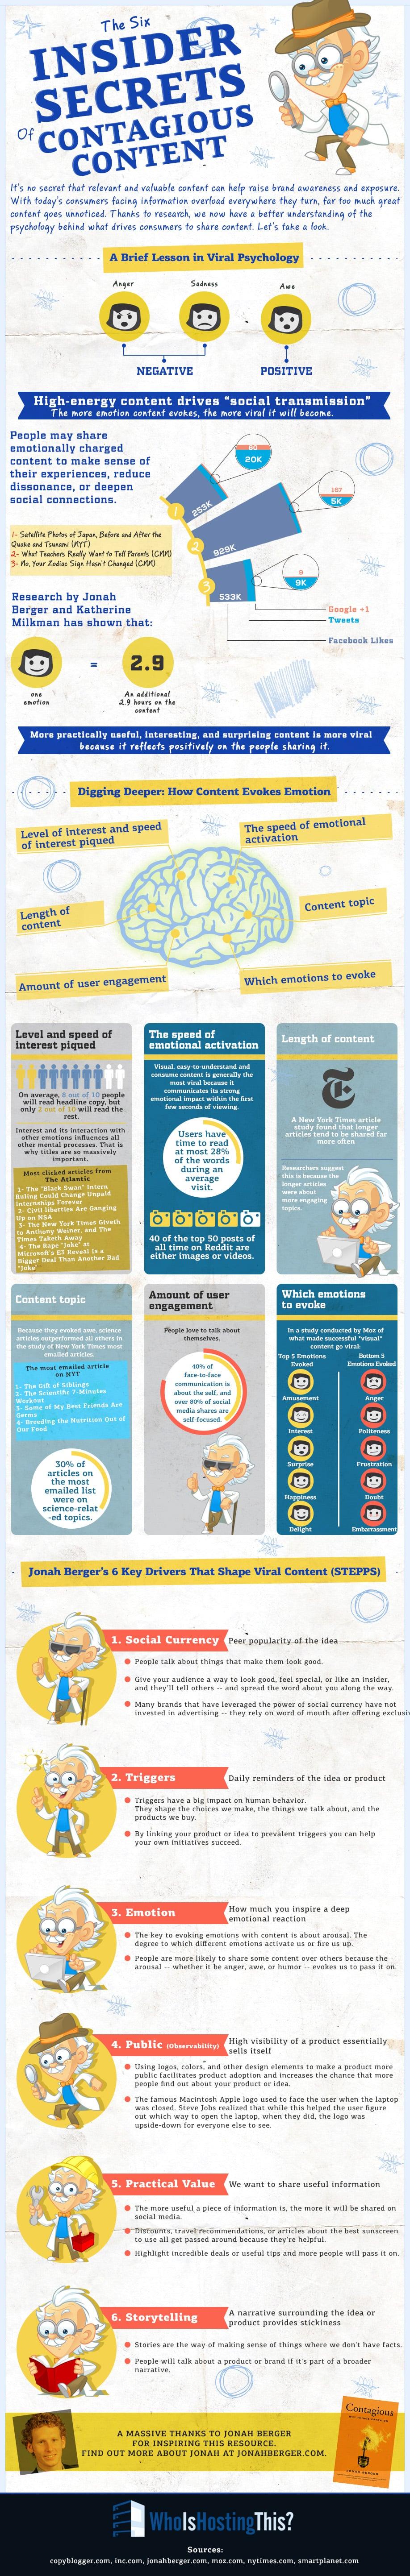 insider secrets infographic